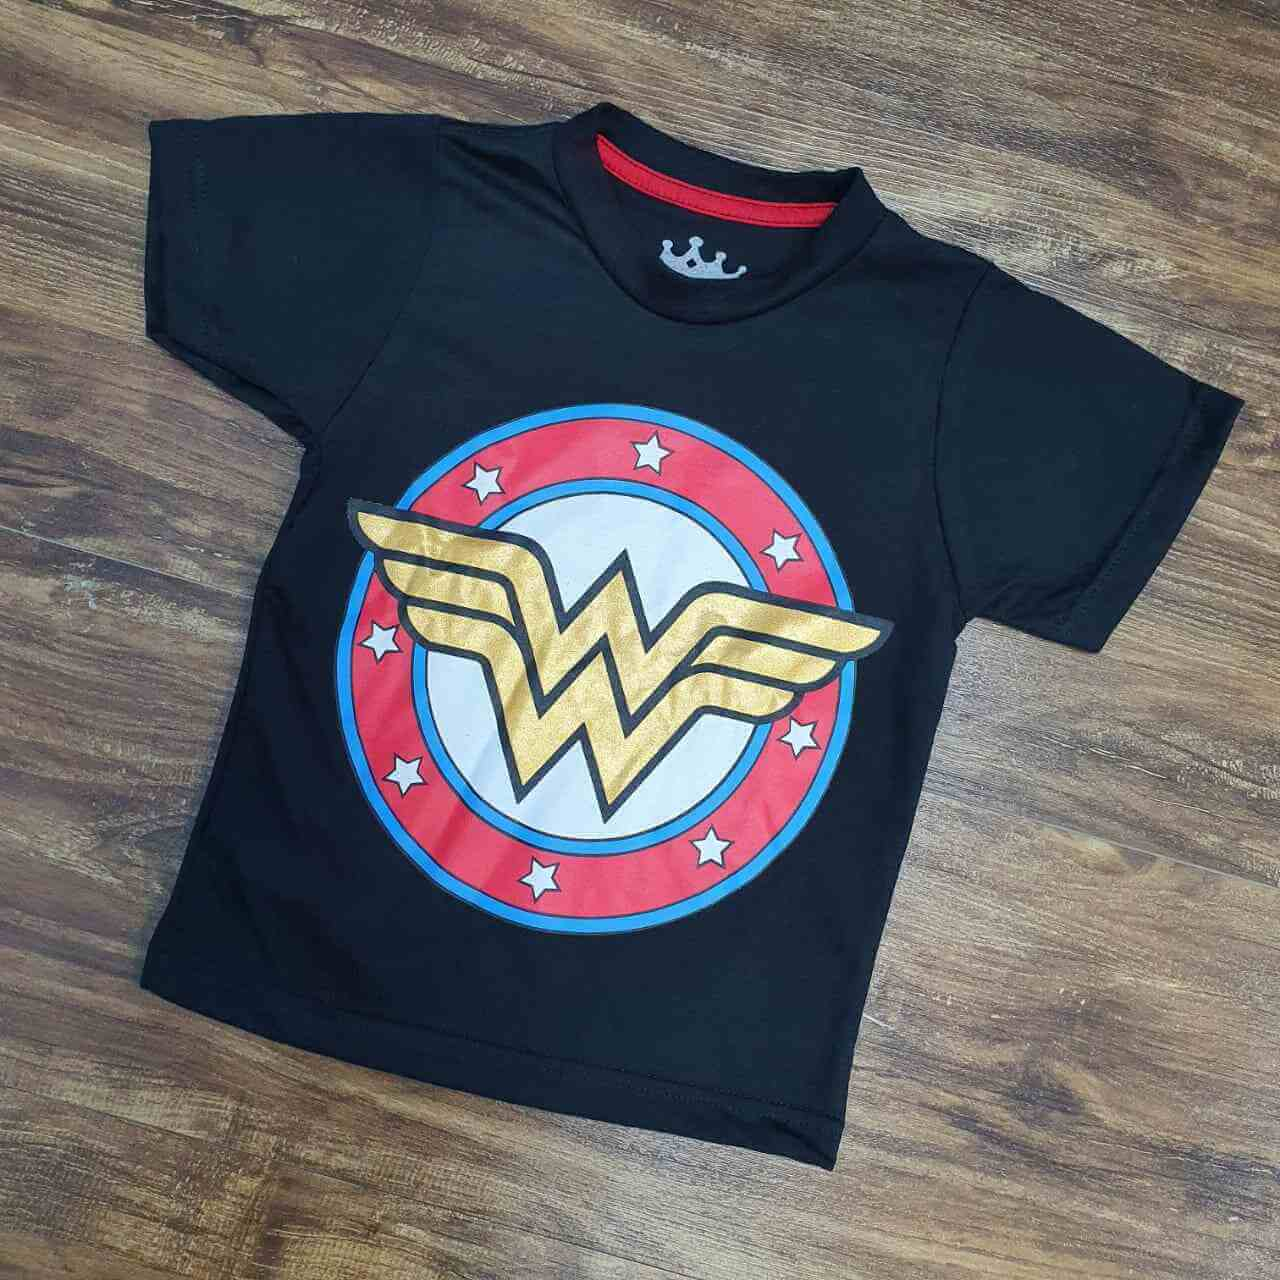 Camiseta Mulher Maravilha Infantil